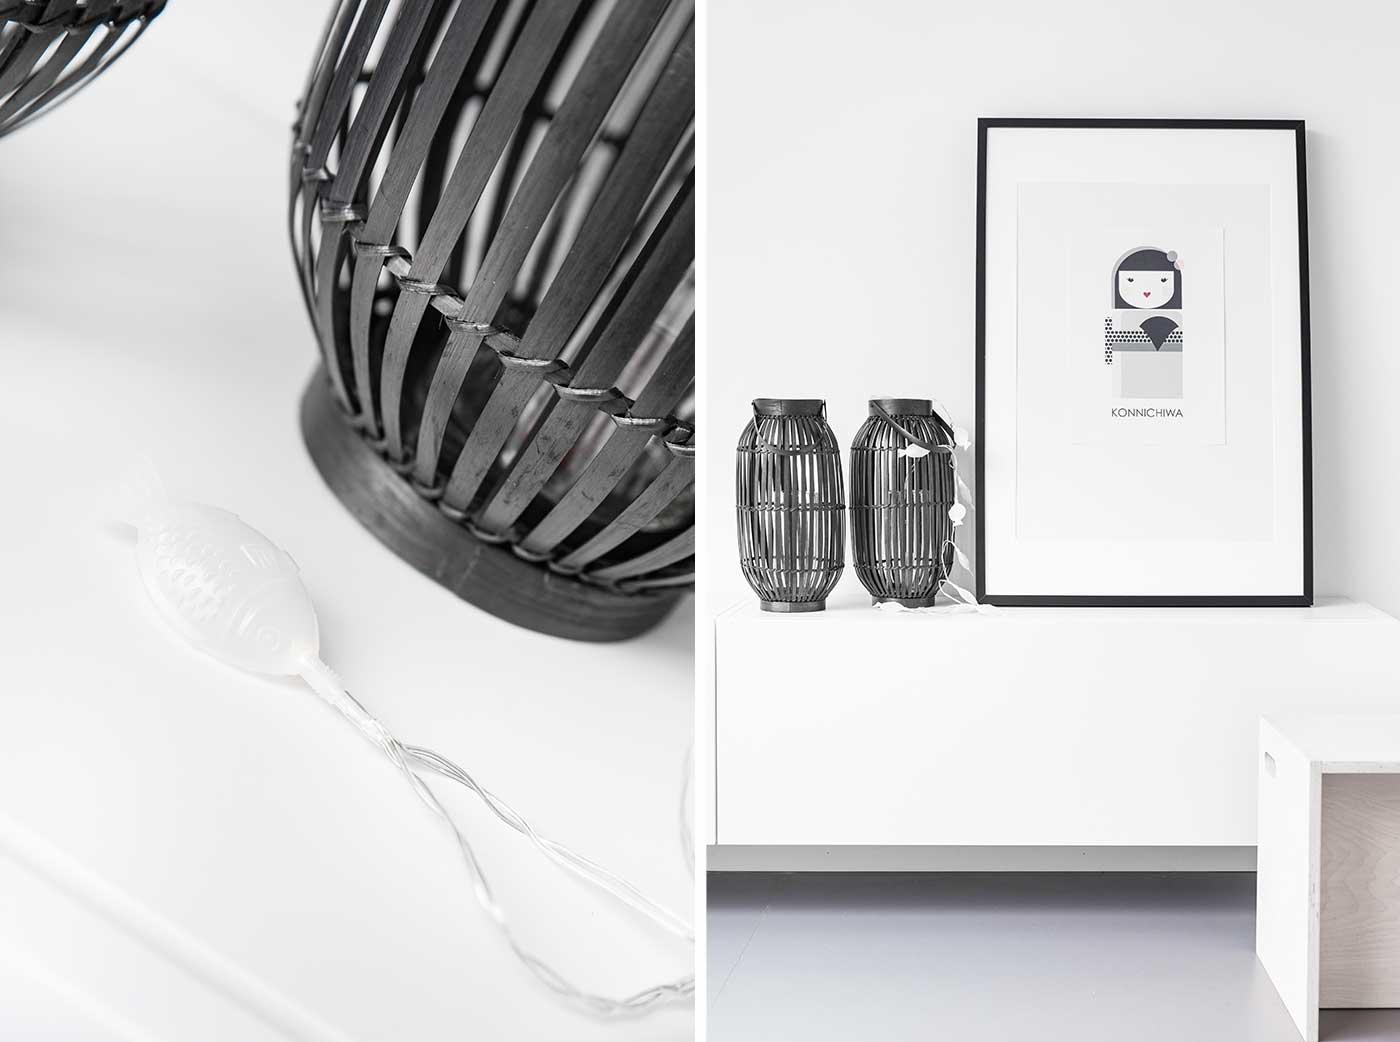 Upcycling: DIY-Lichterkette